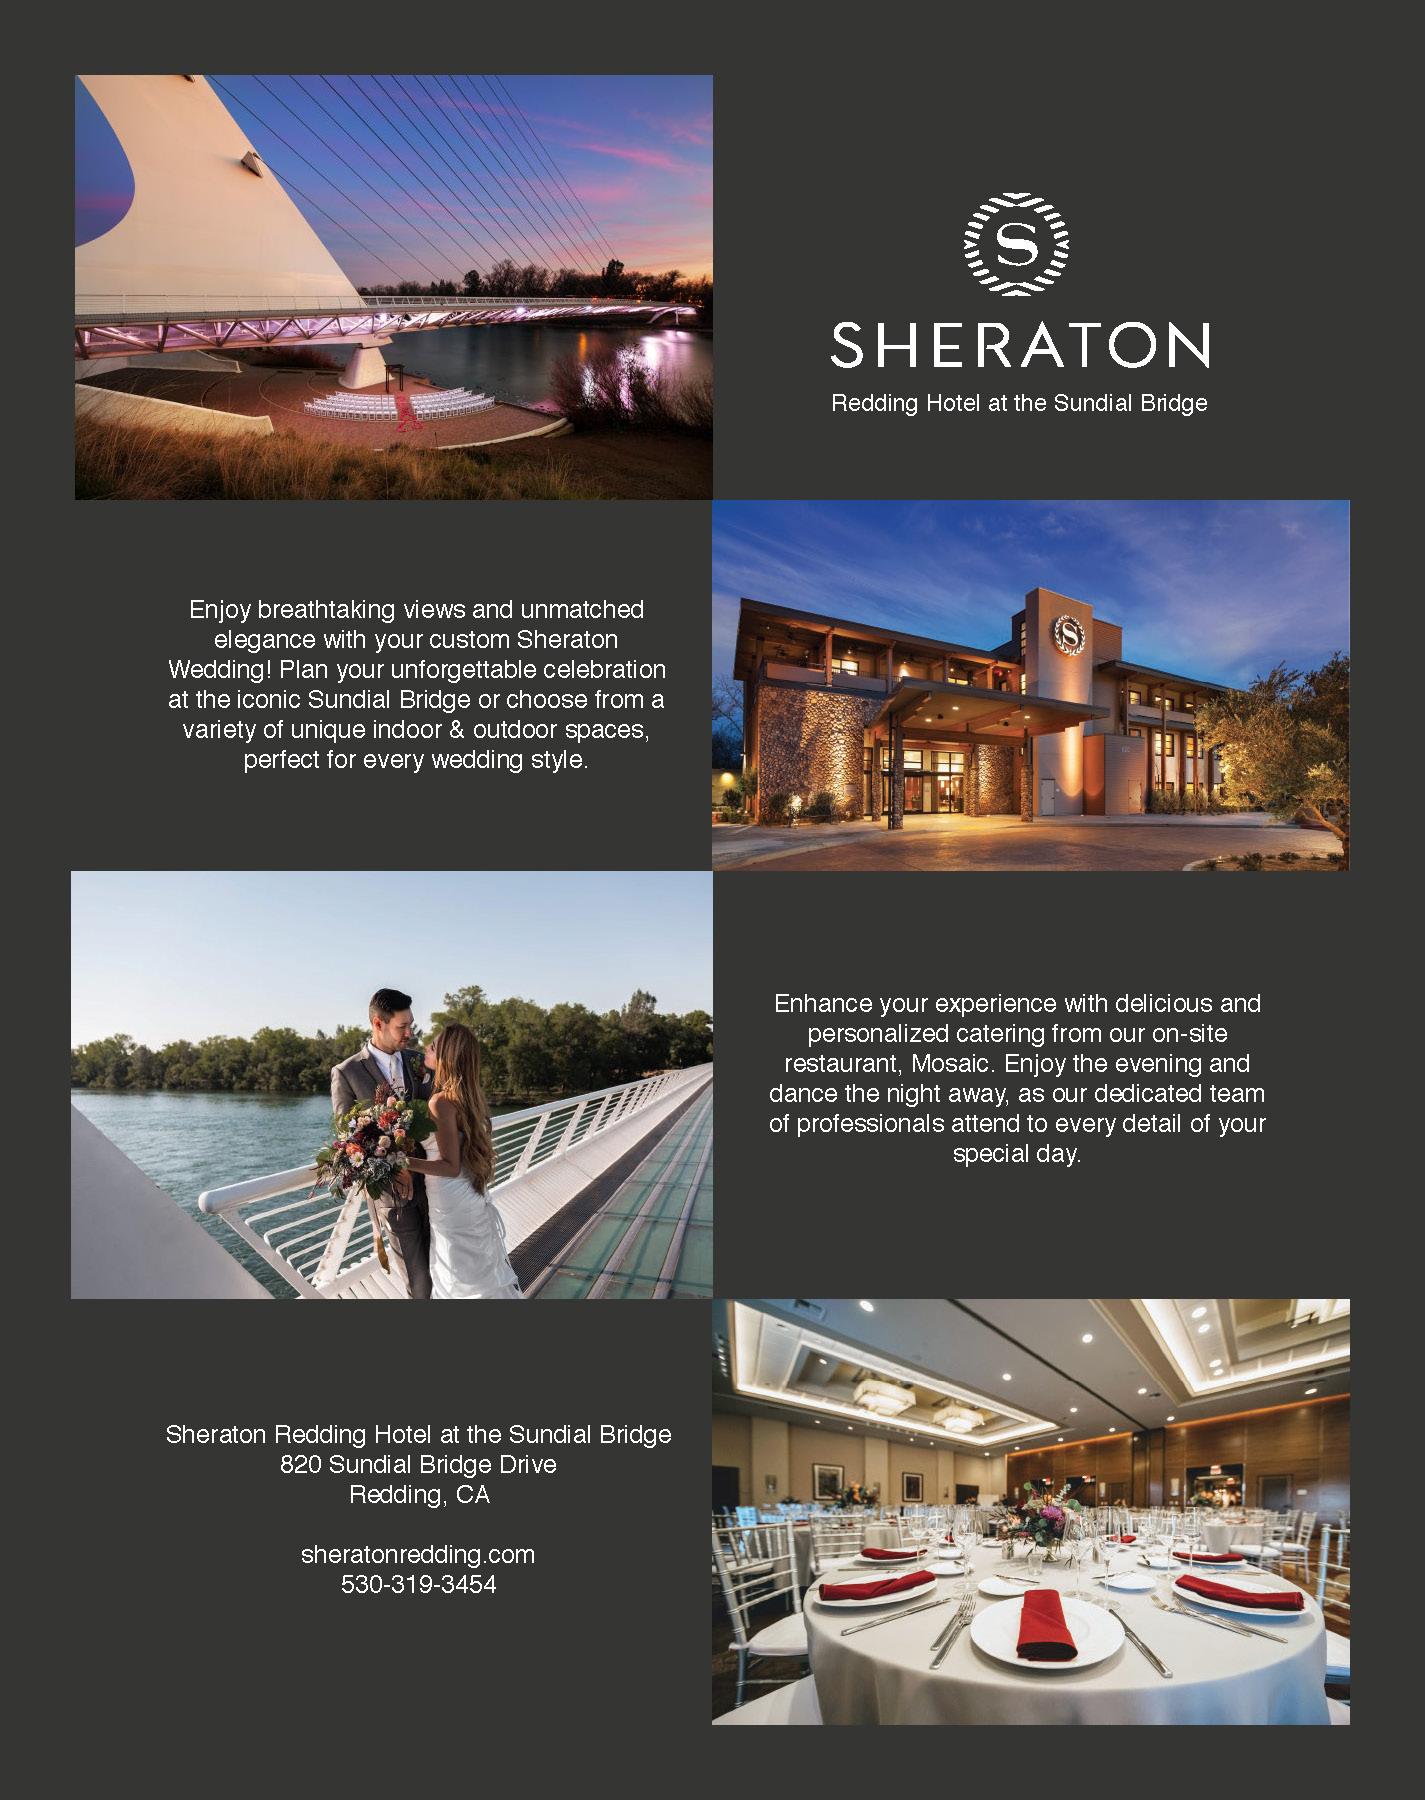 Shearaton Redding Wedding Venue.jpg